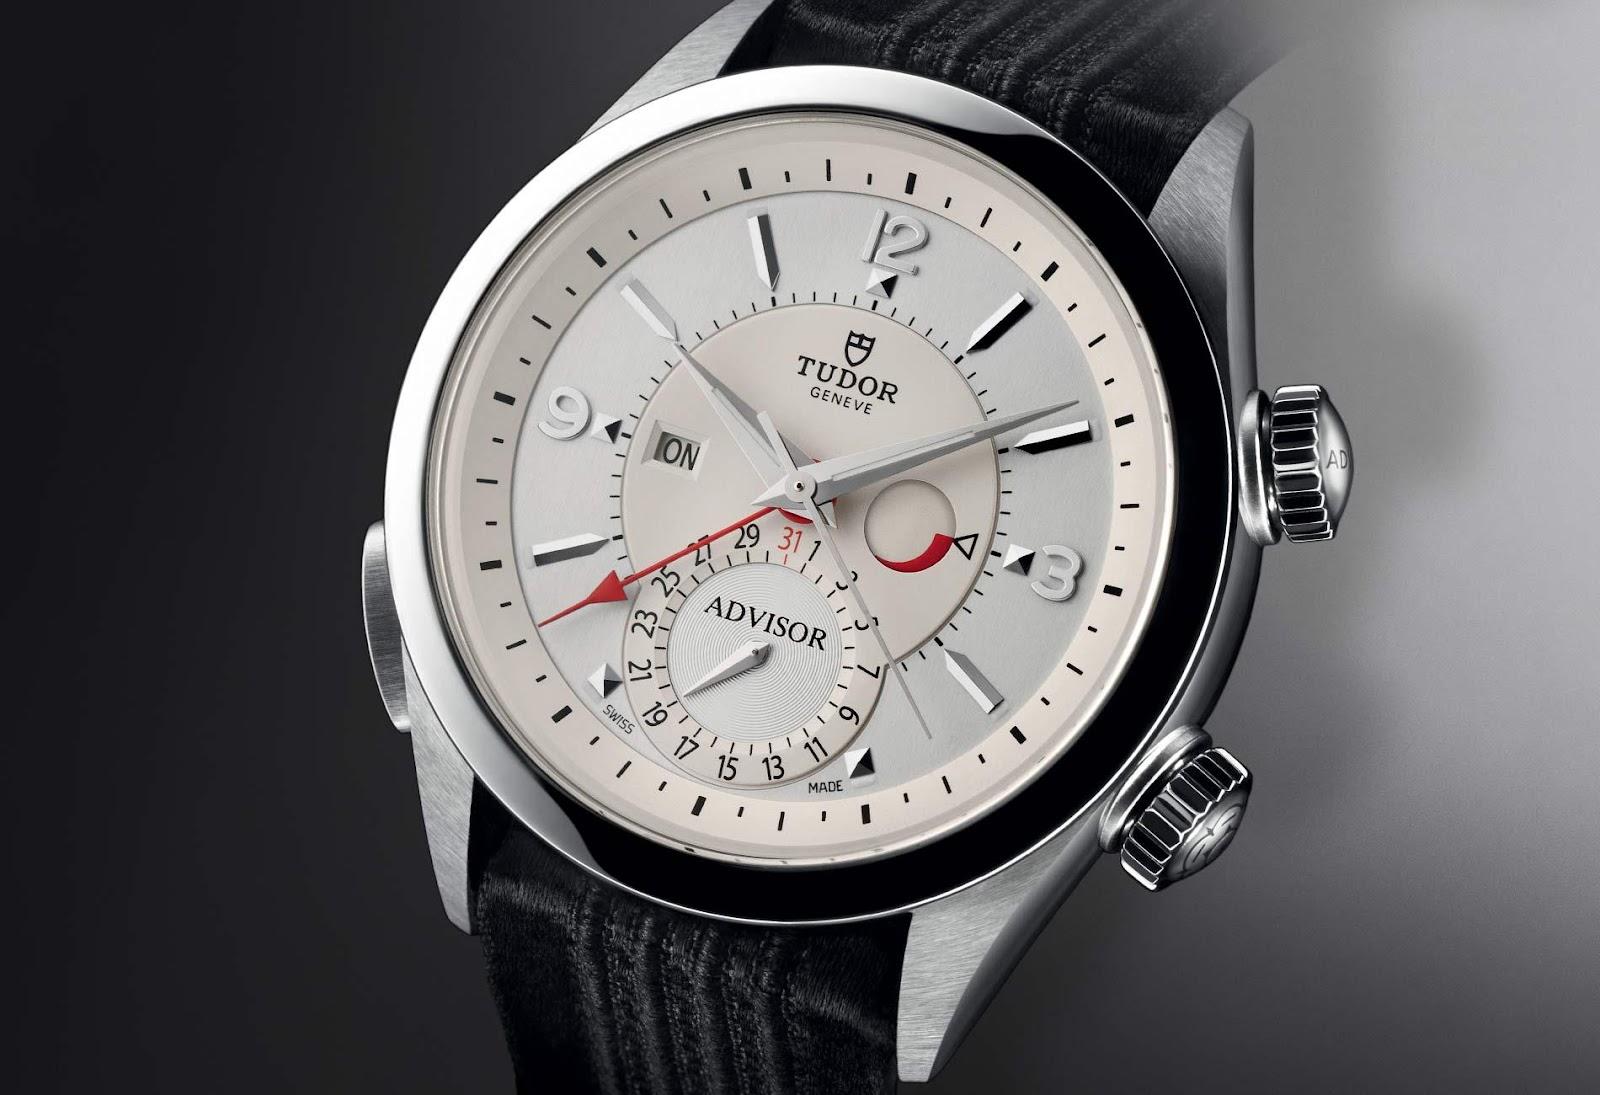 TUDOR Heritage Advisor Swiss Watch